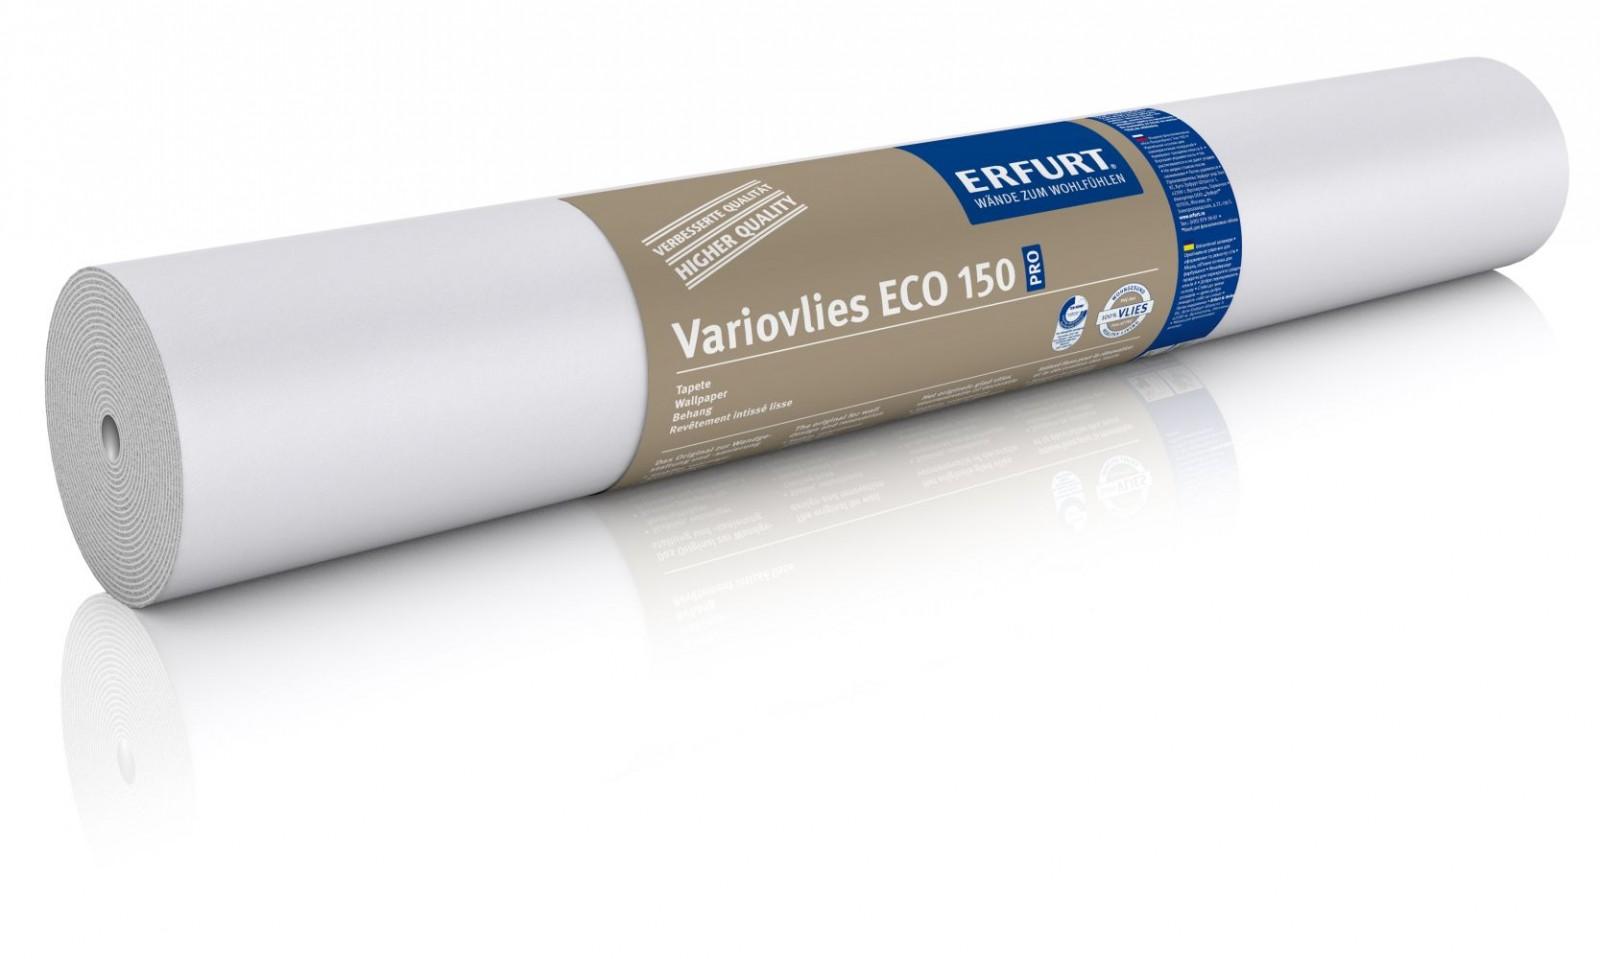 4x lining paper erfurt ecovlies ev 150 wallpaper 75 m. Black Bedroom Furniture Sets. Home Design Ideas